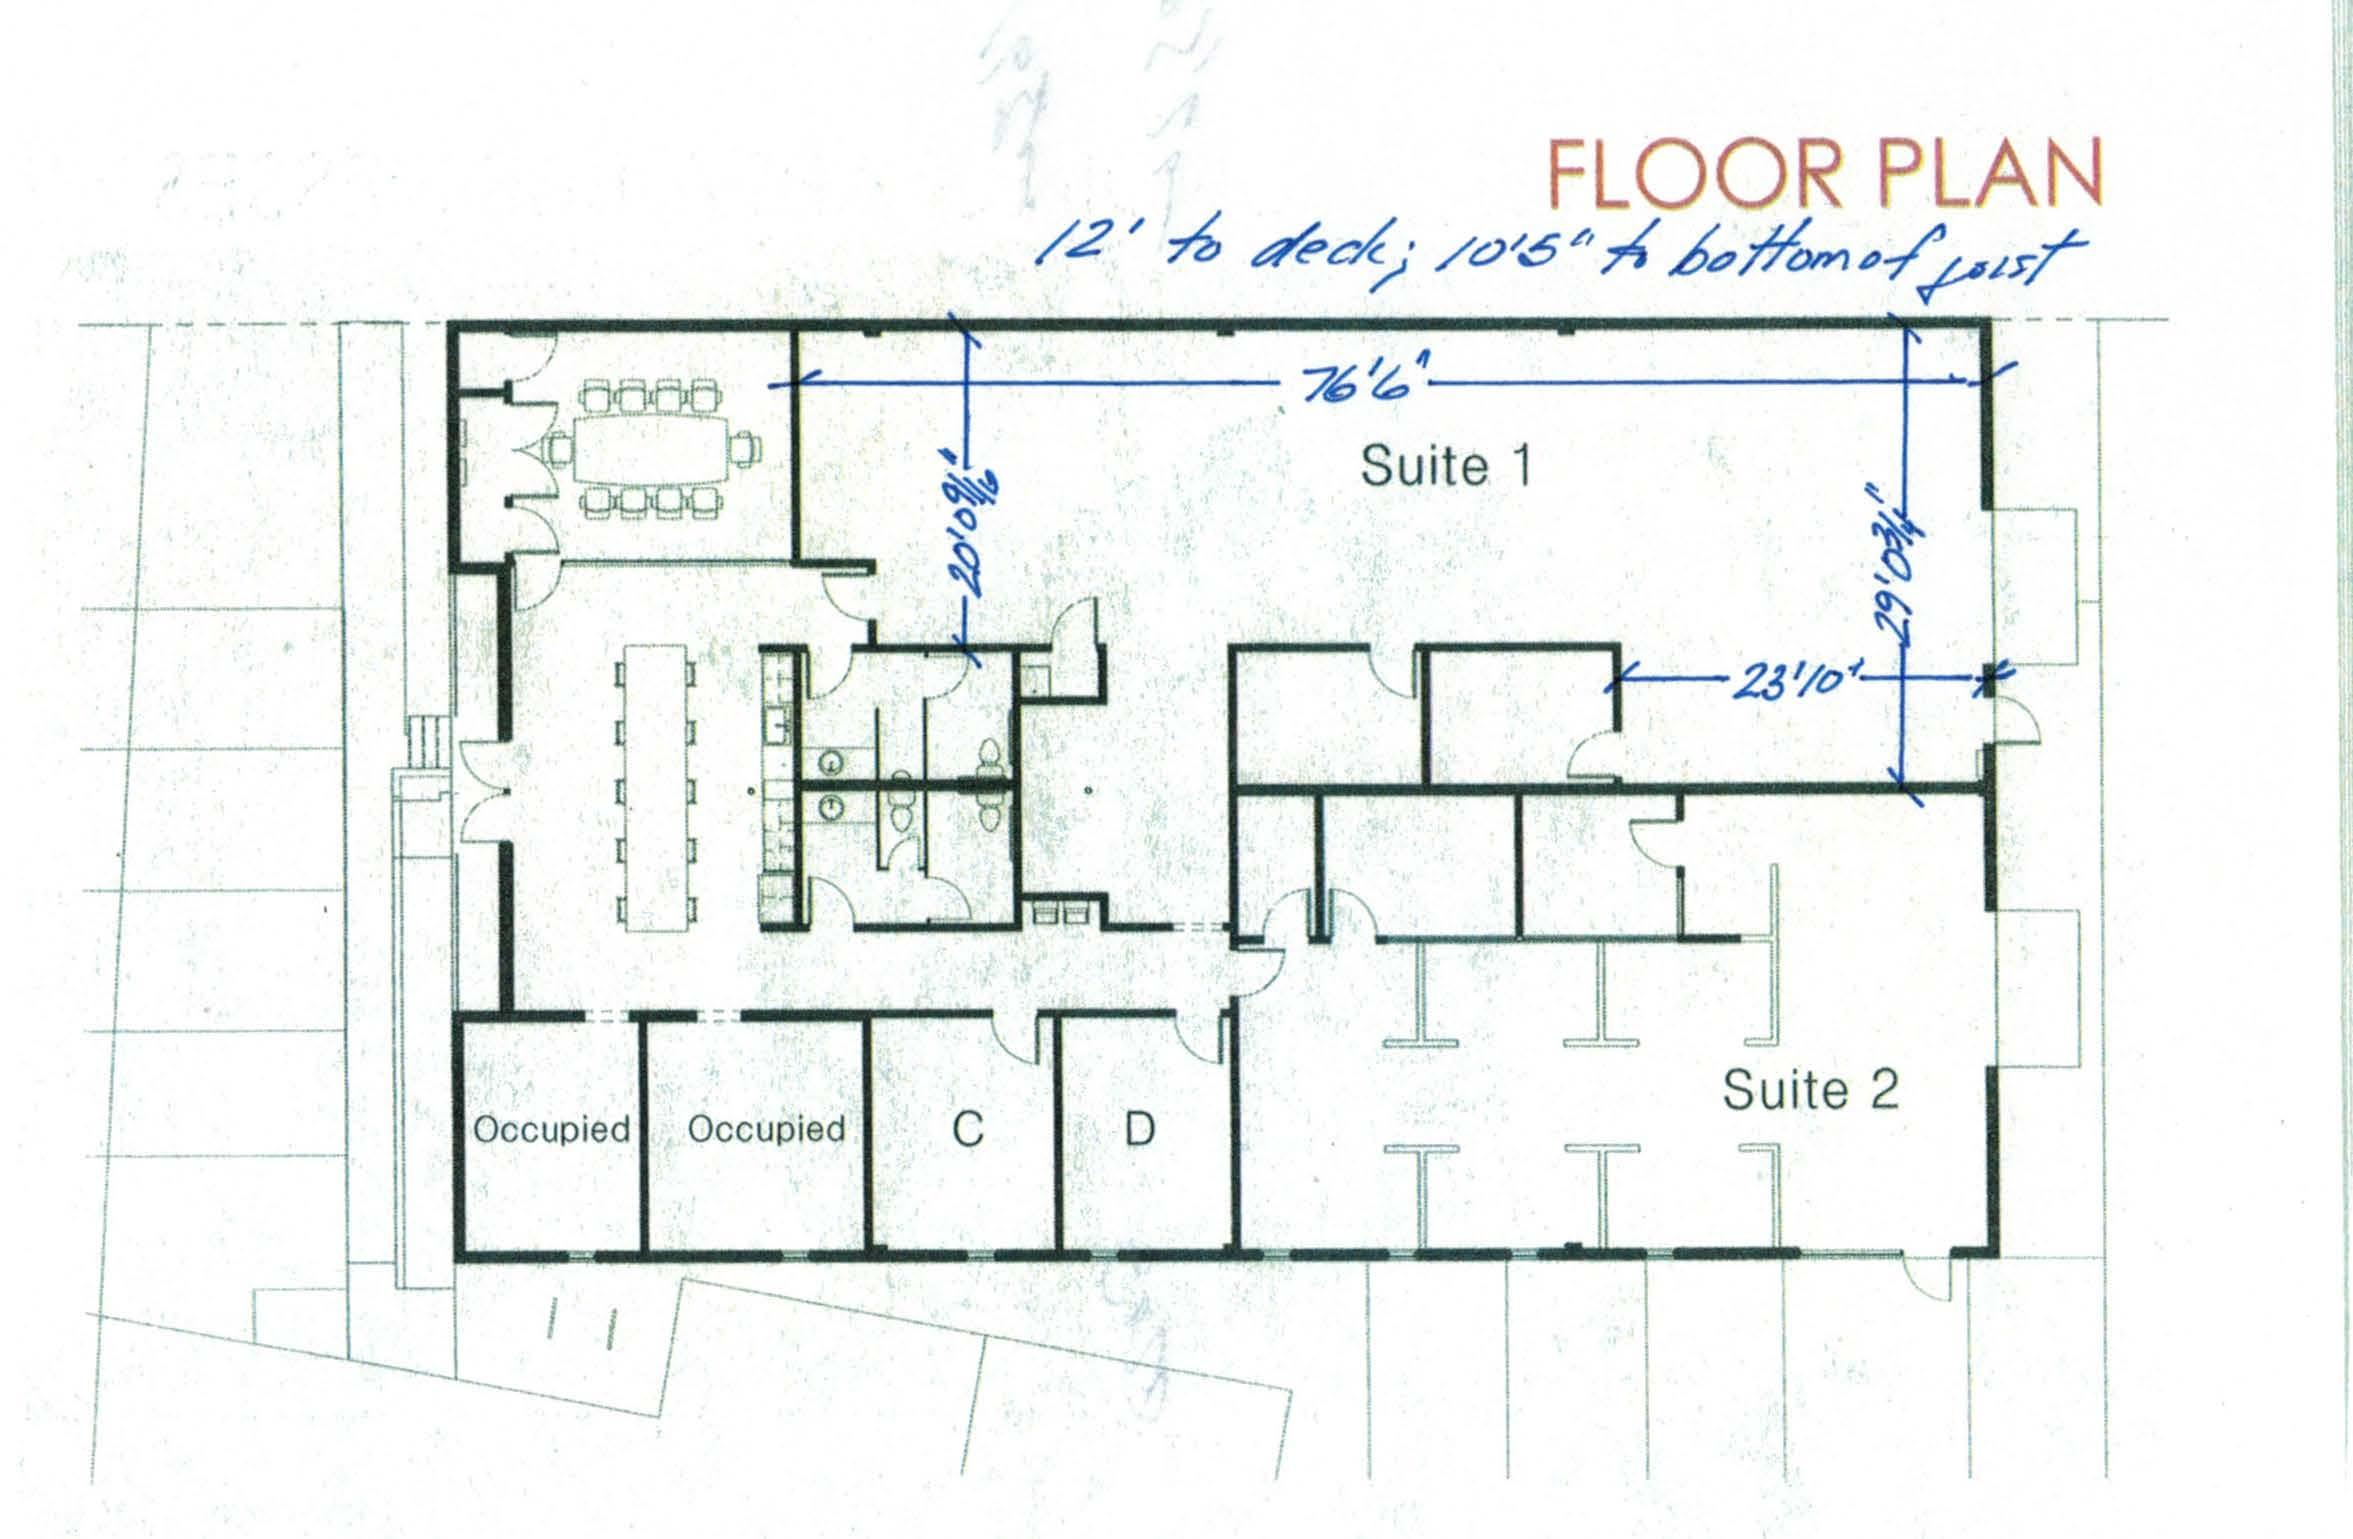 2131 floor plan.jpg